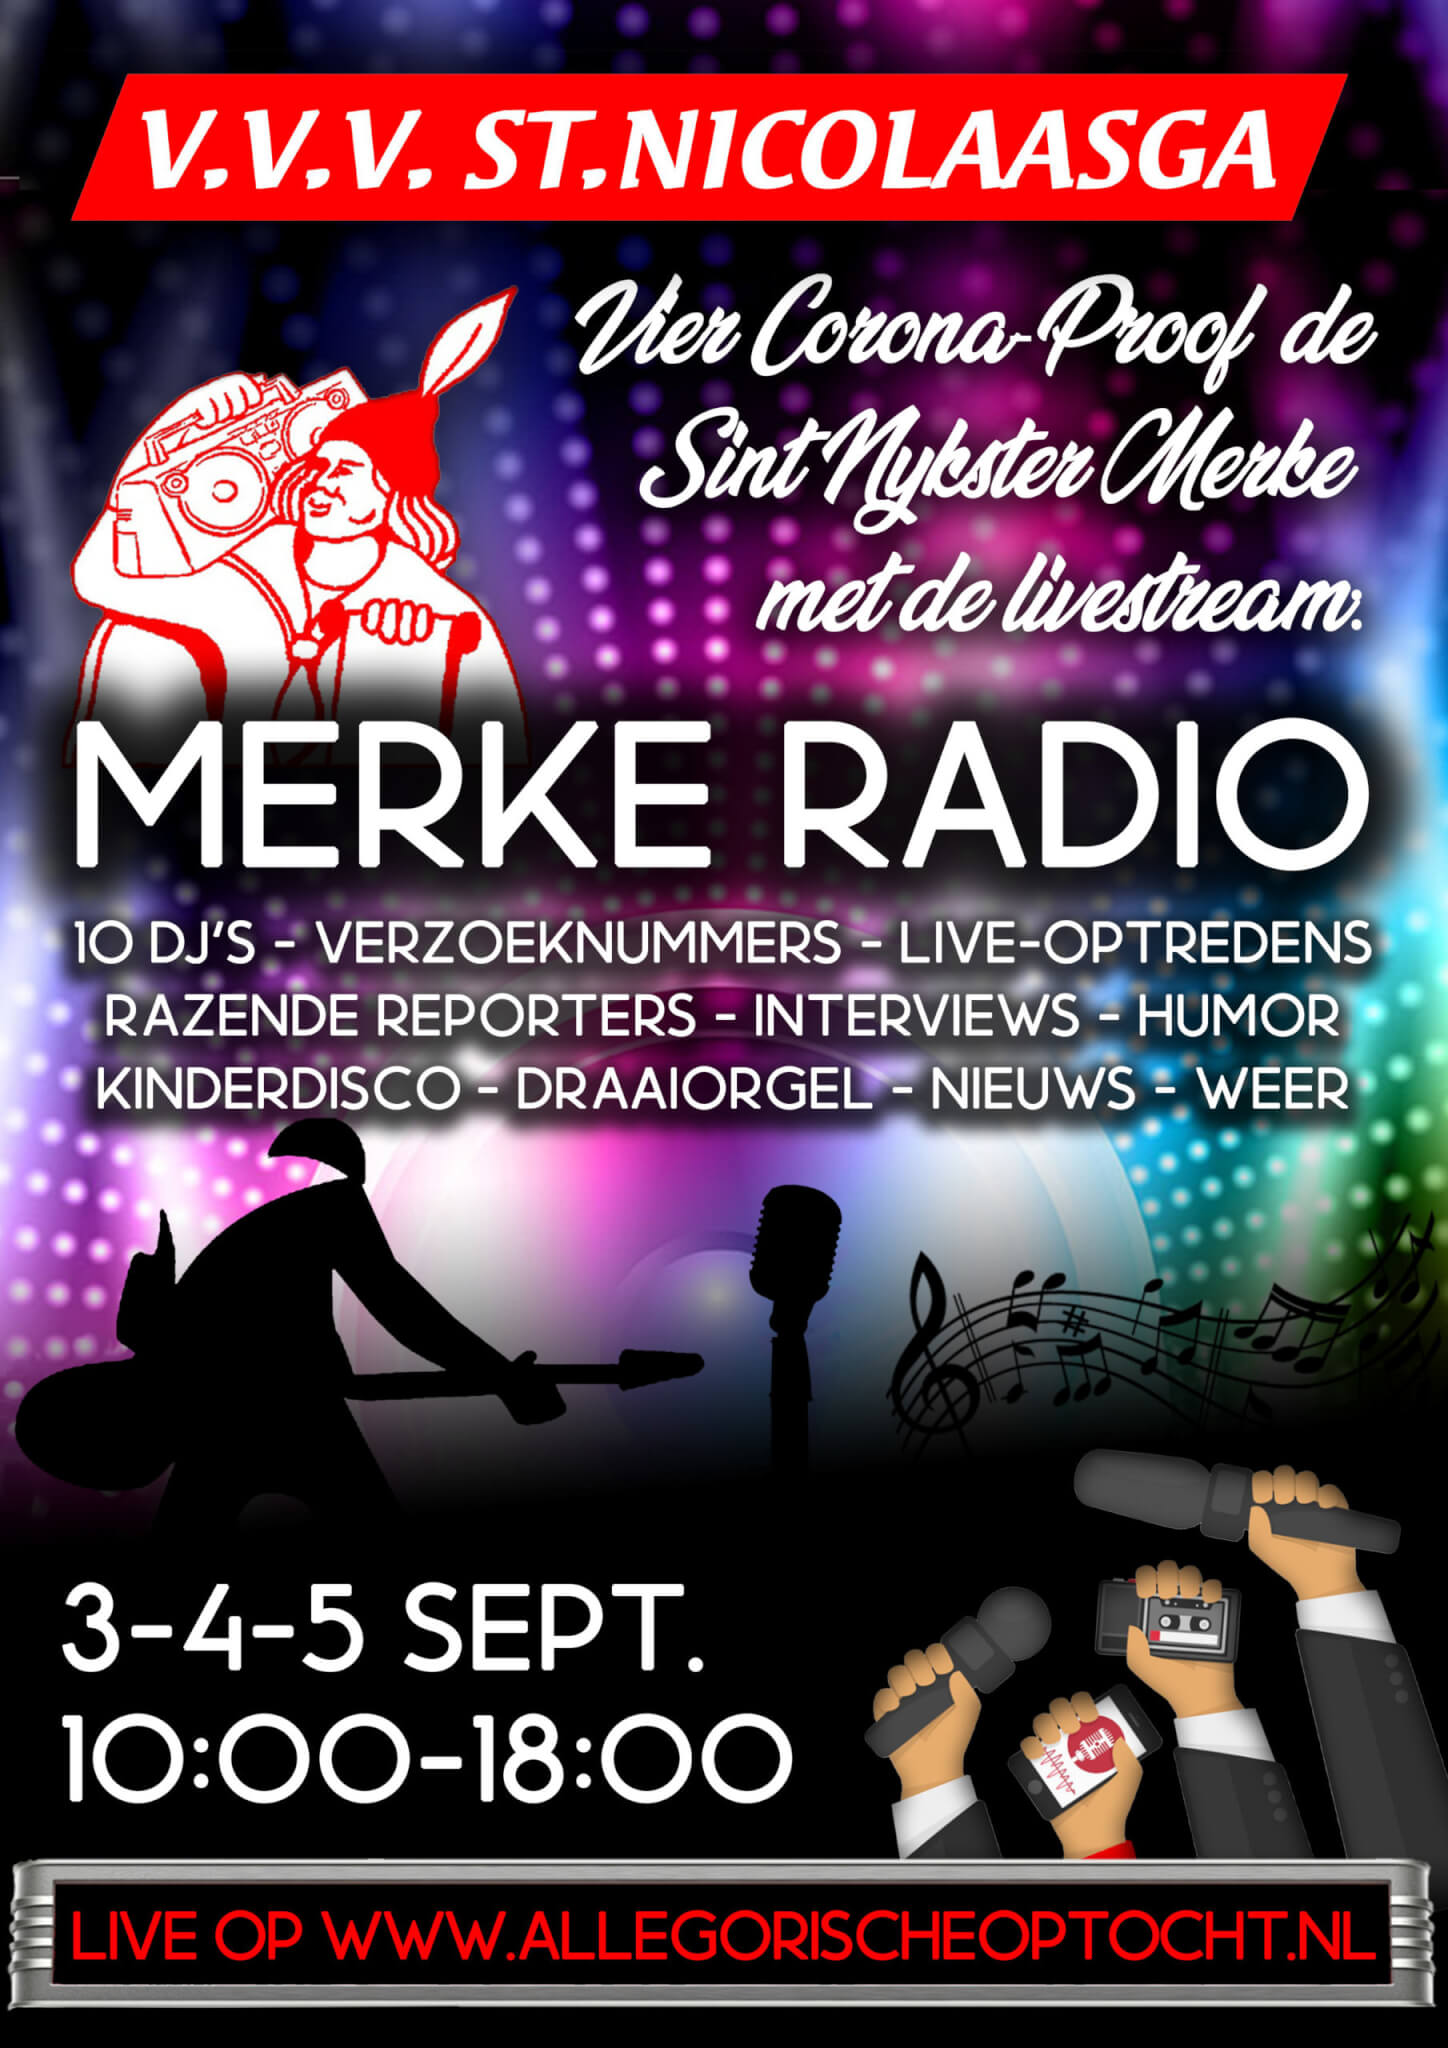 VVV Merke Radio